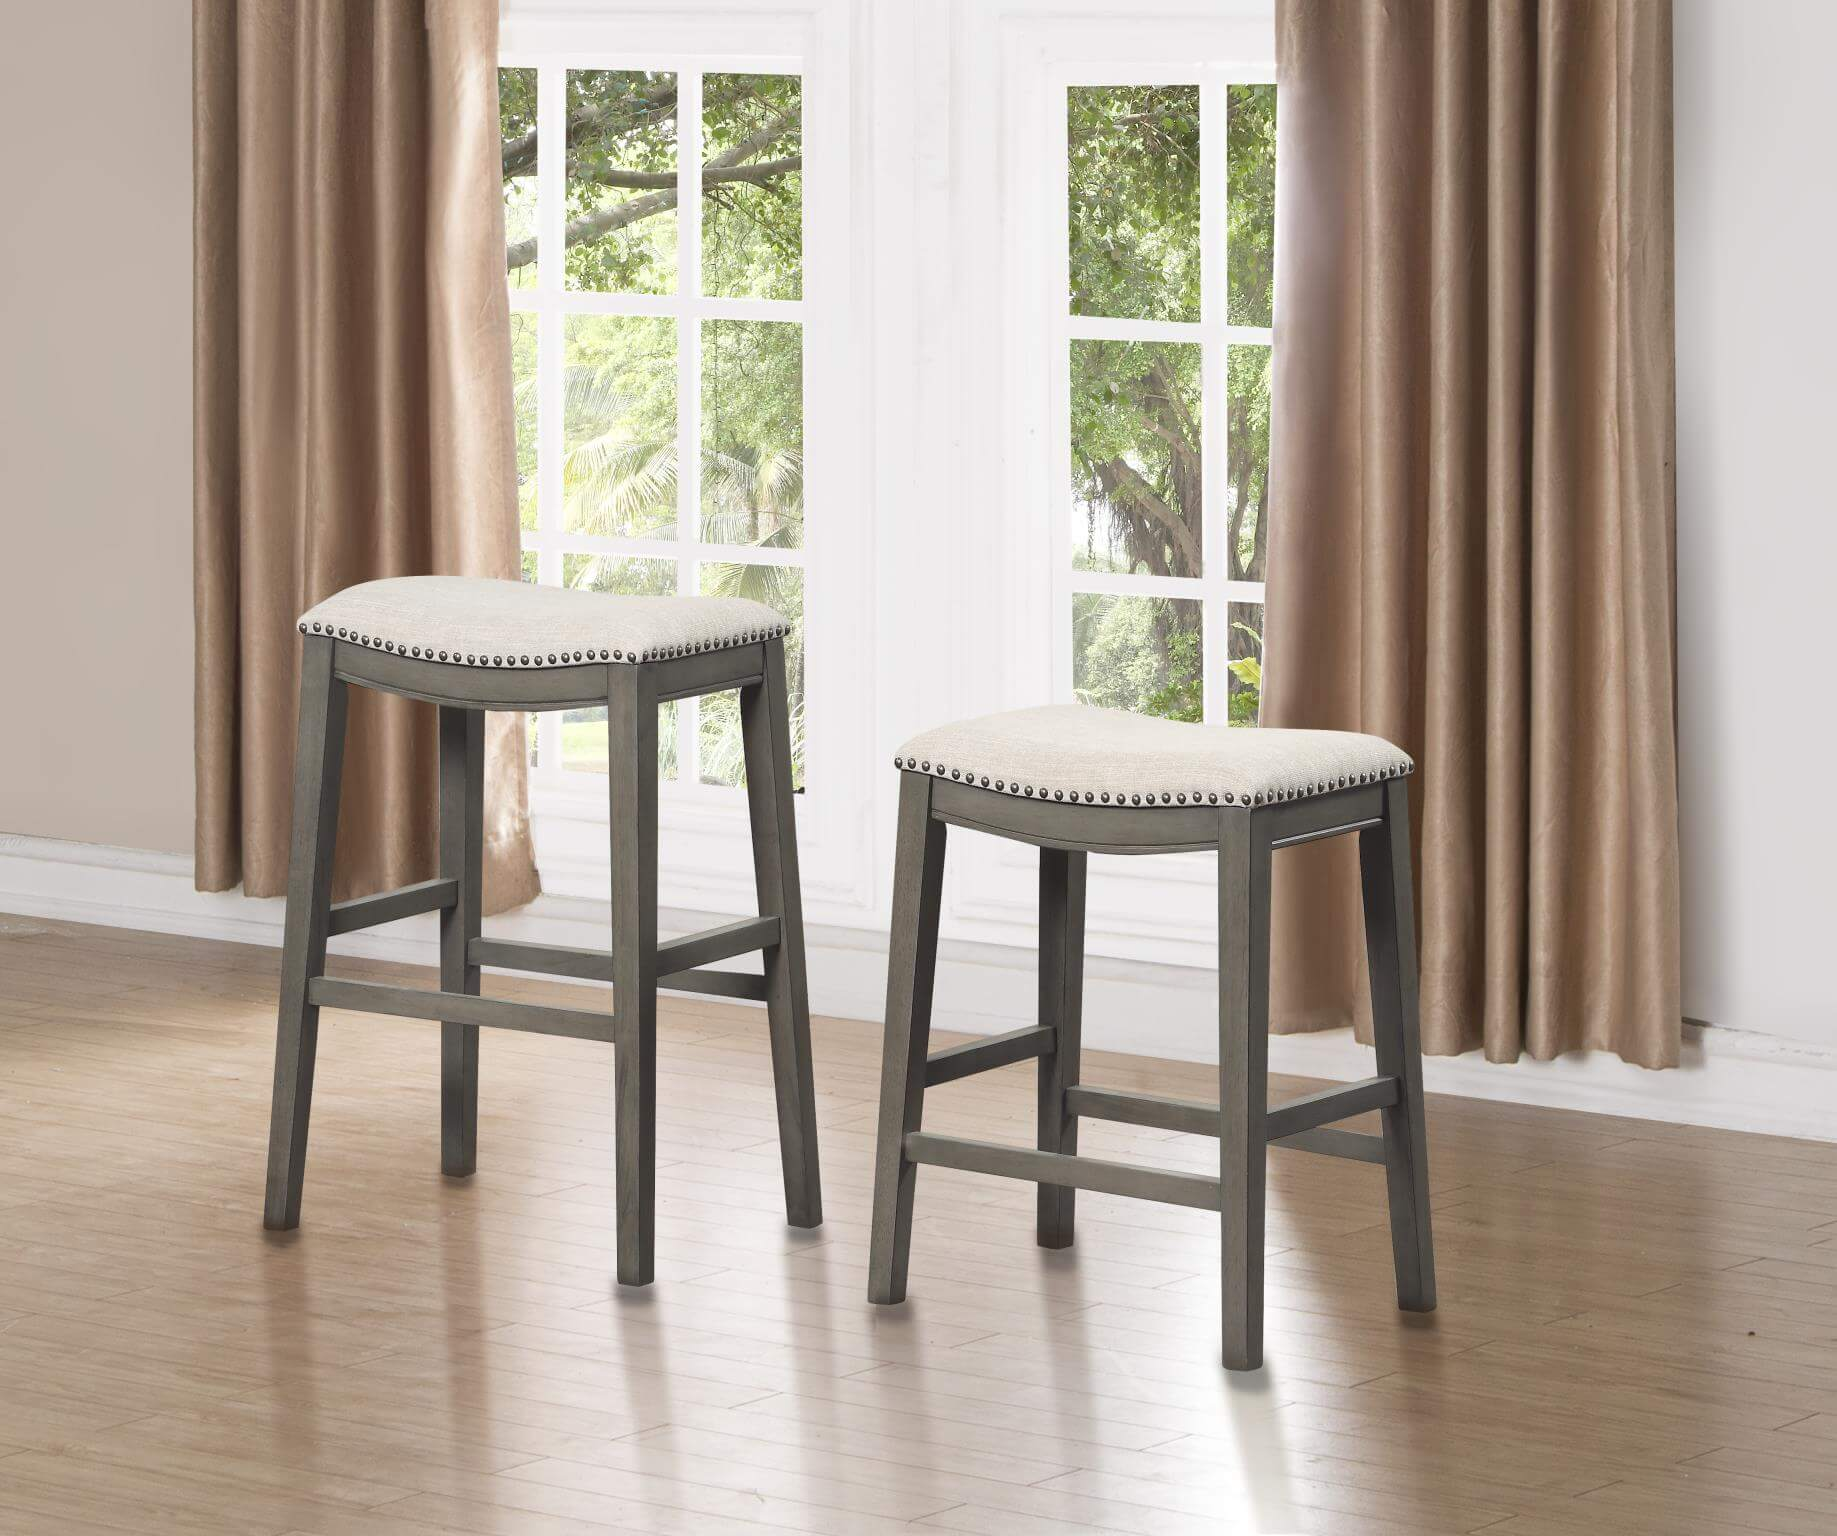 433 kith grey and linen wood barstool